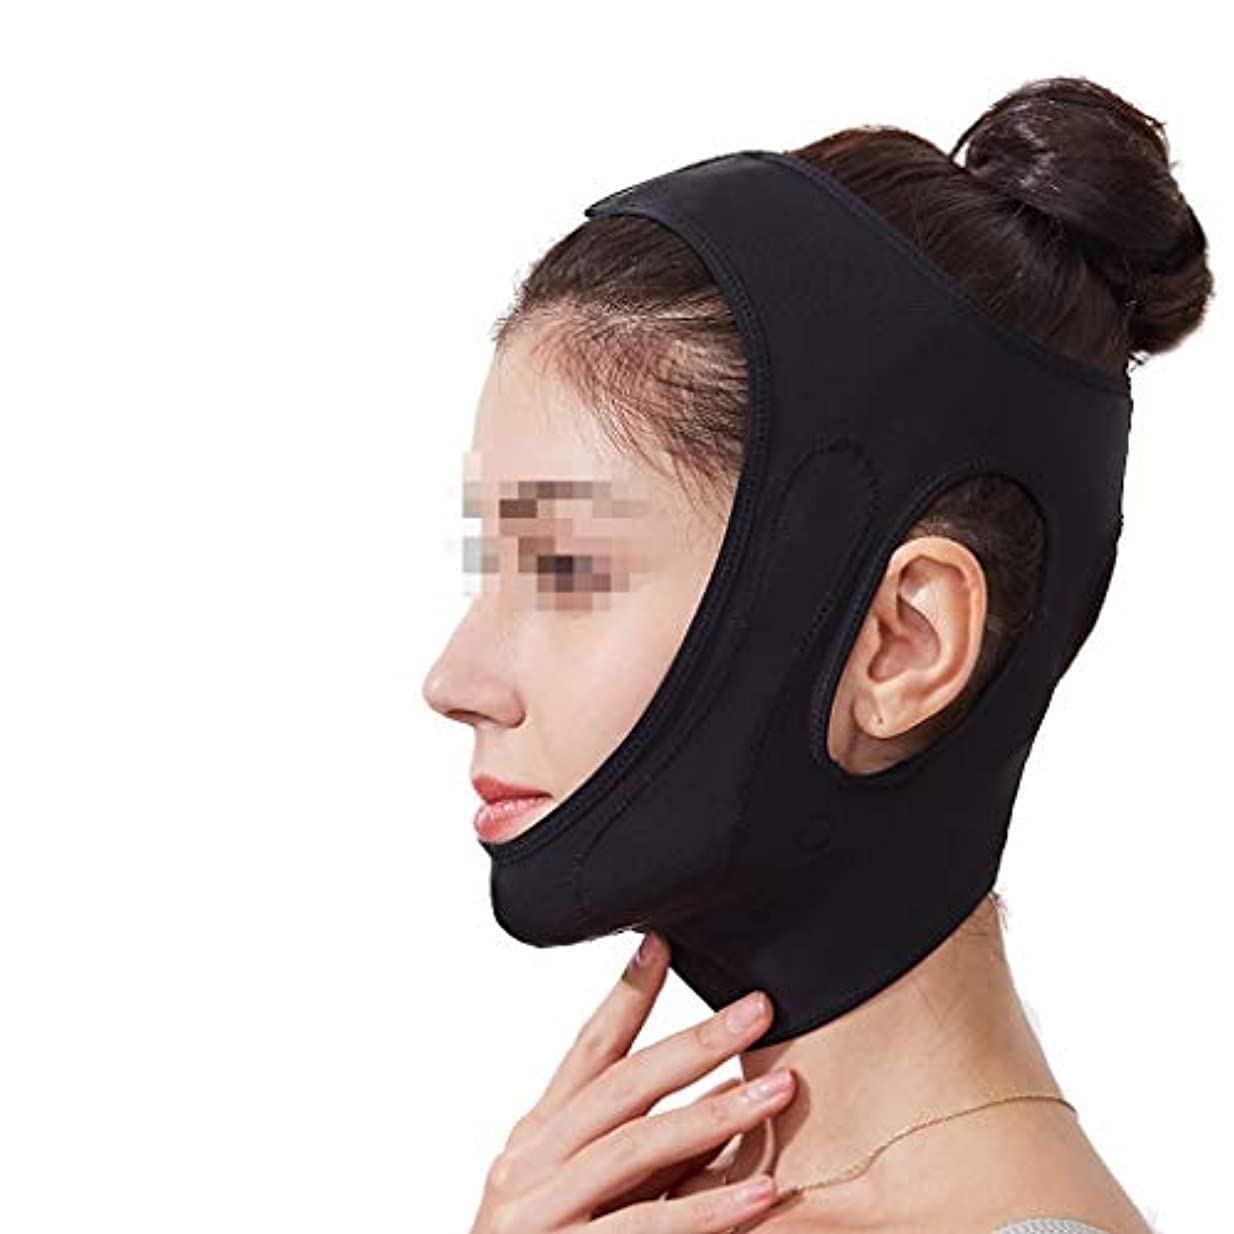 XHLMRMJ フェイスリフティング包帯、フェイスマスクフェイスリフトあご快適な顔マルチカラーオプション (Color : Black)